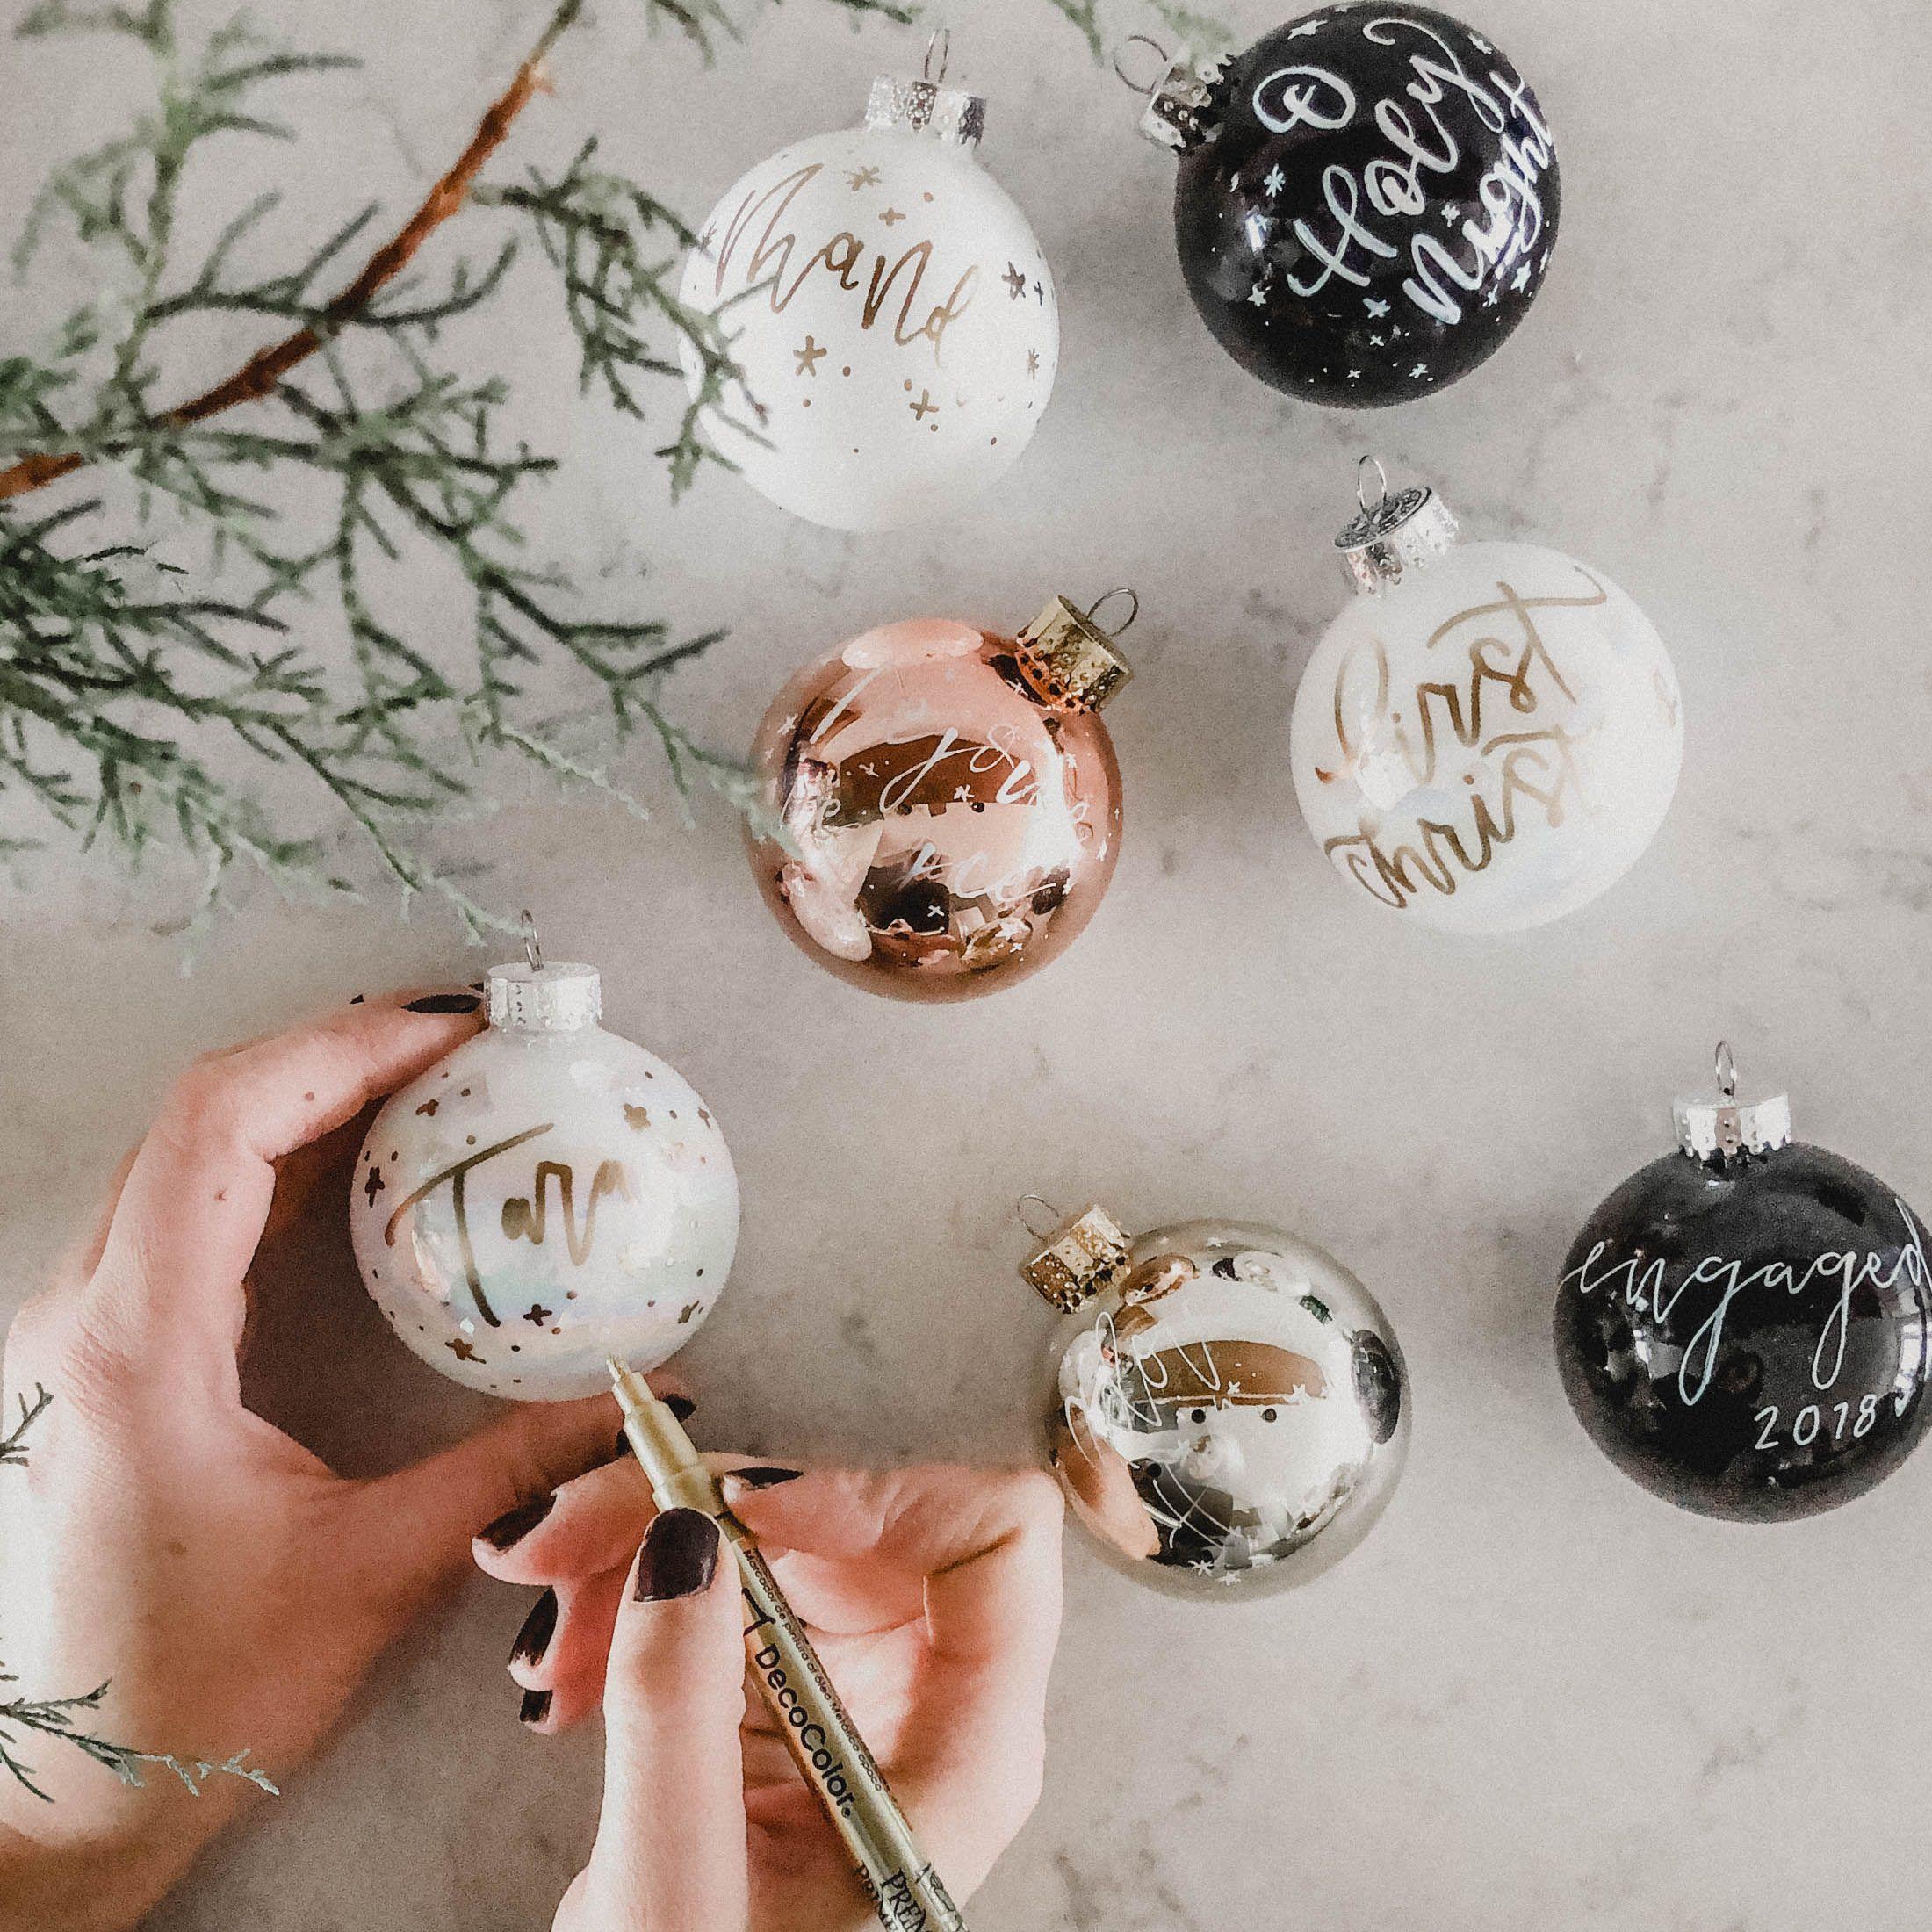 Diy Handlettered Ornaments 3 Ways To Make Them Lemon Thistle Diy Christmas Ornaments Christmas Diy Christmas Ornaments